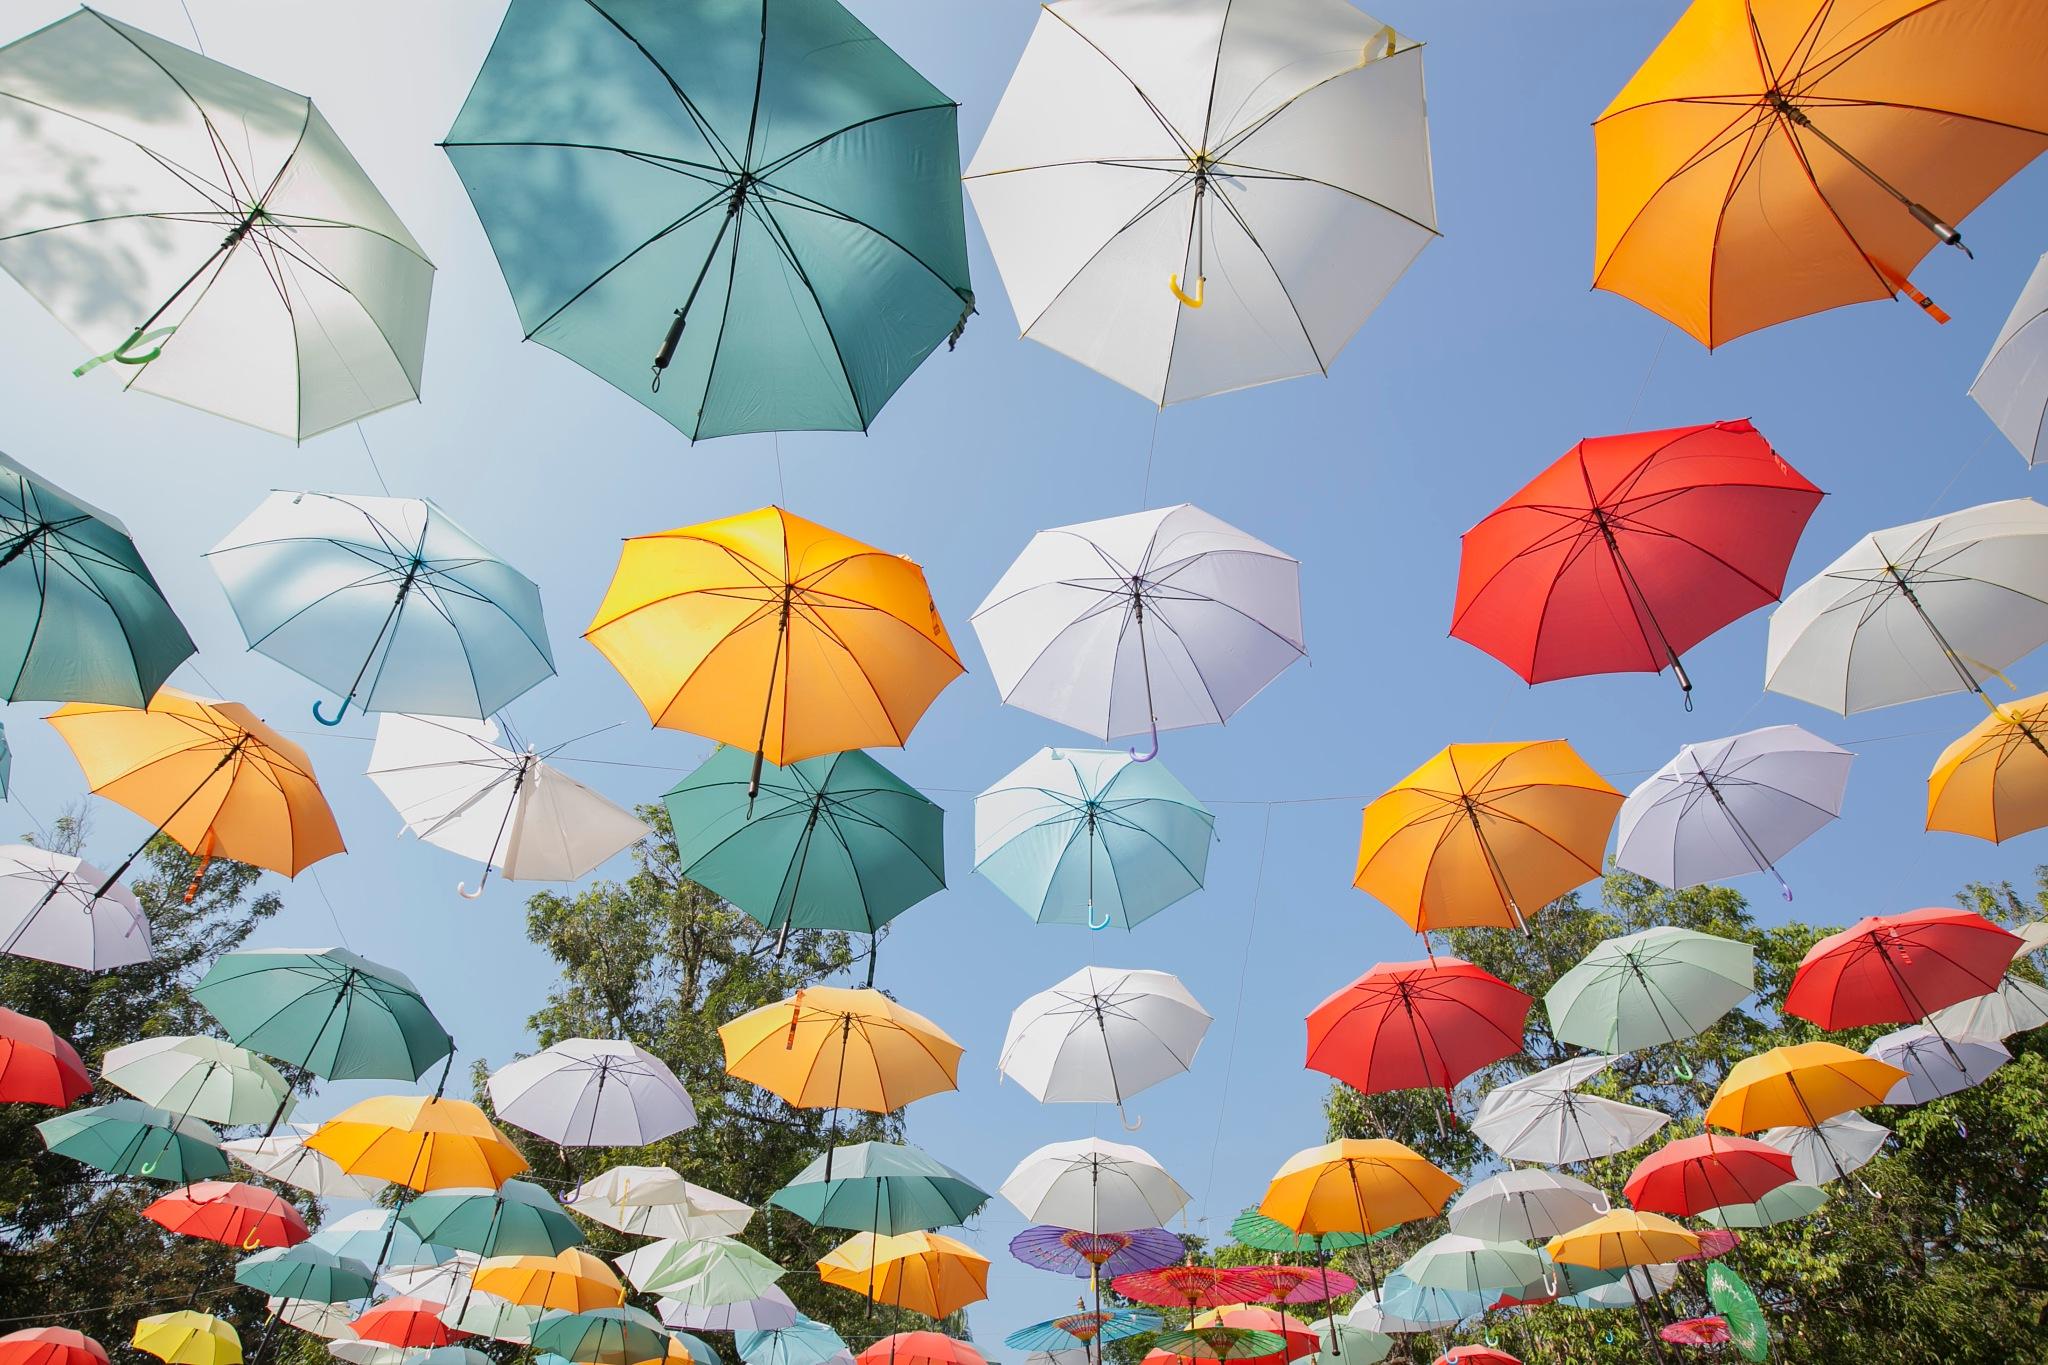 Hanging colored umbrellas by Helga Kuiper